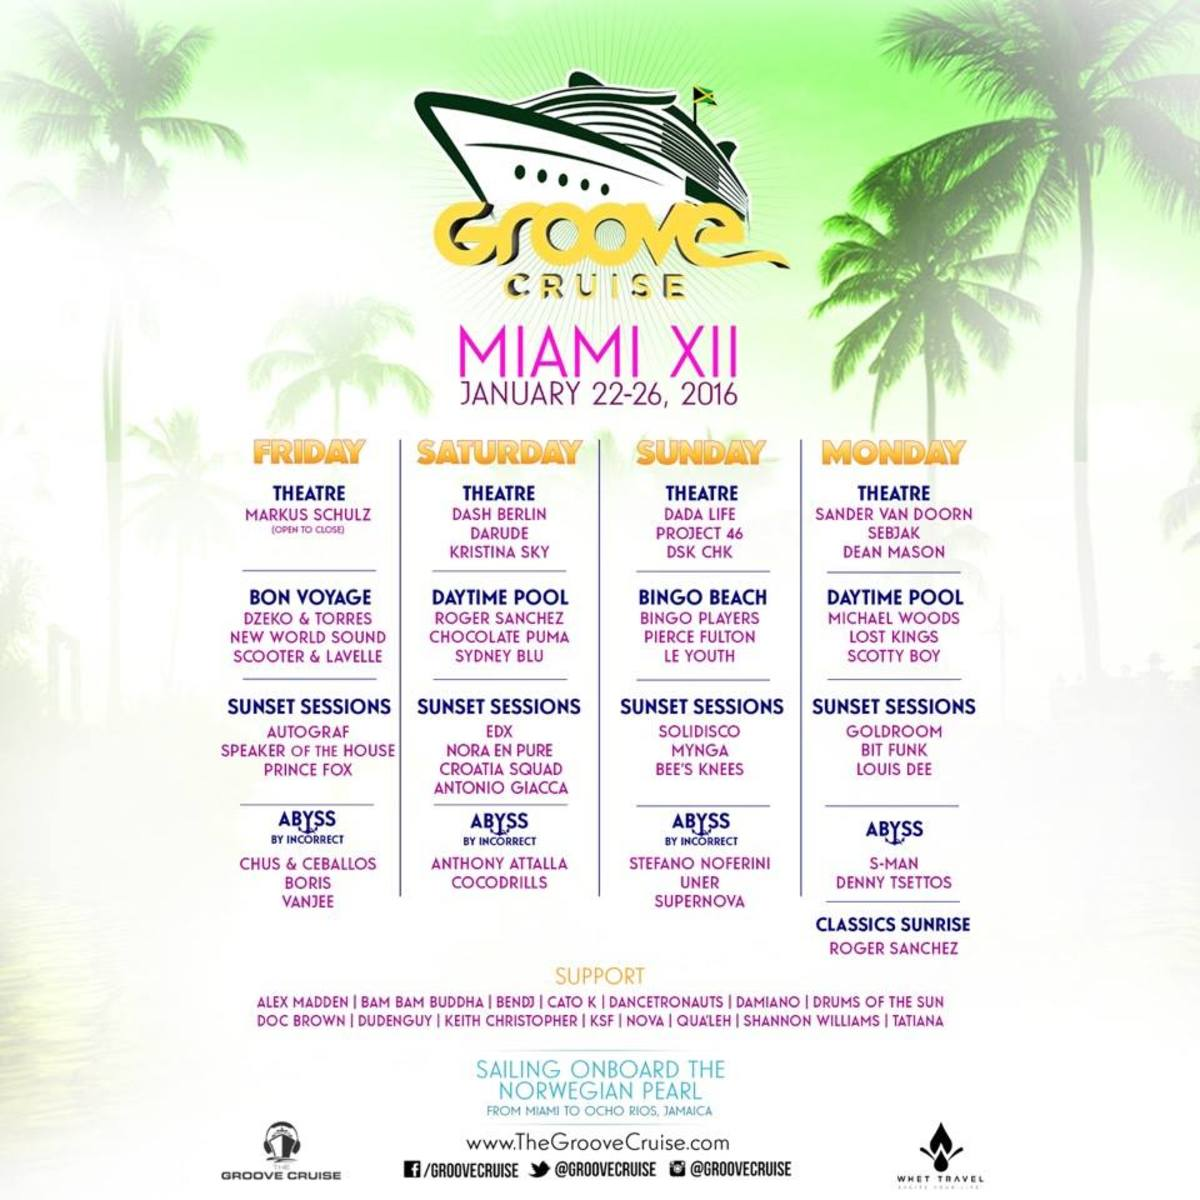 Groove Cruise Miami 2016